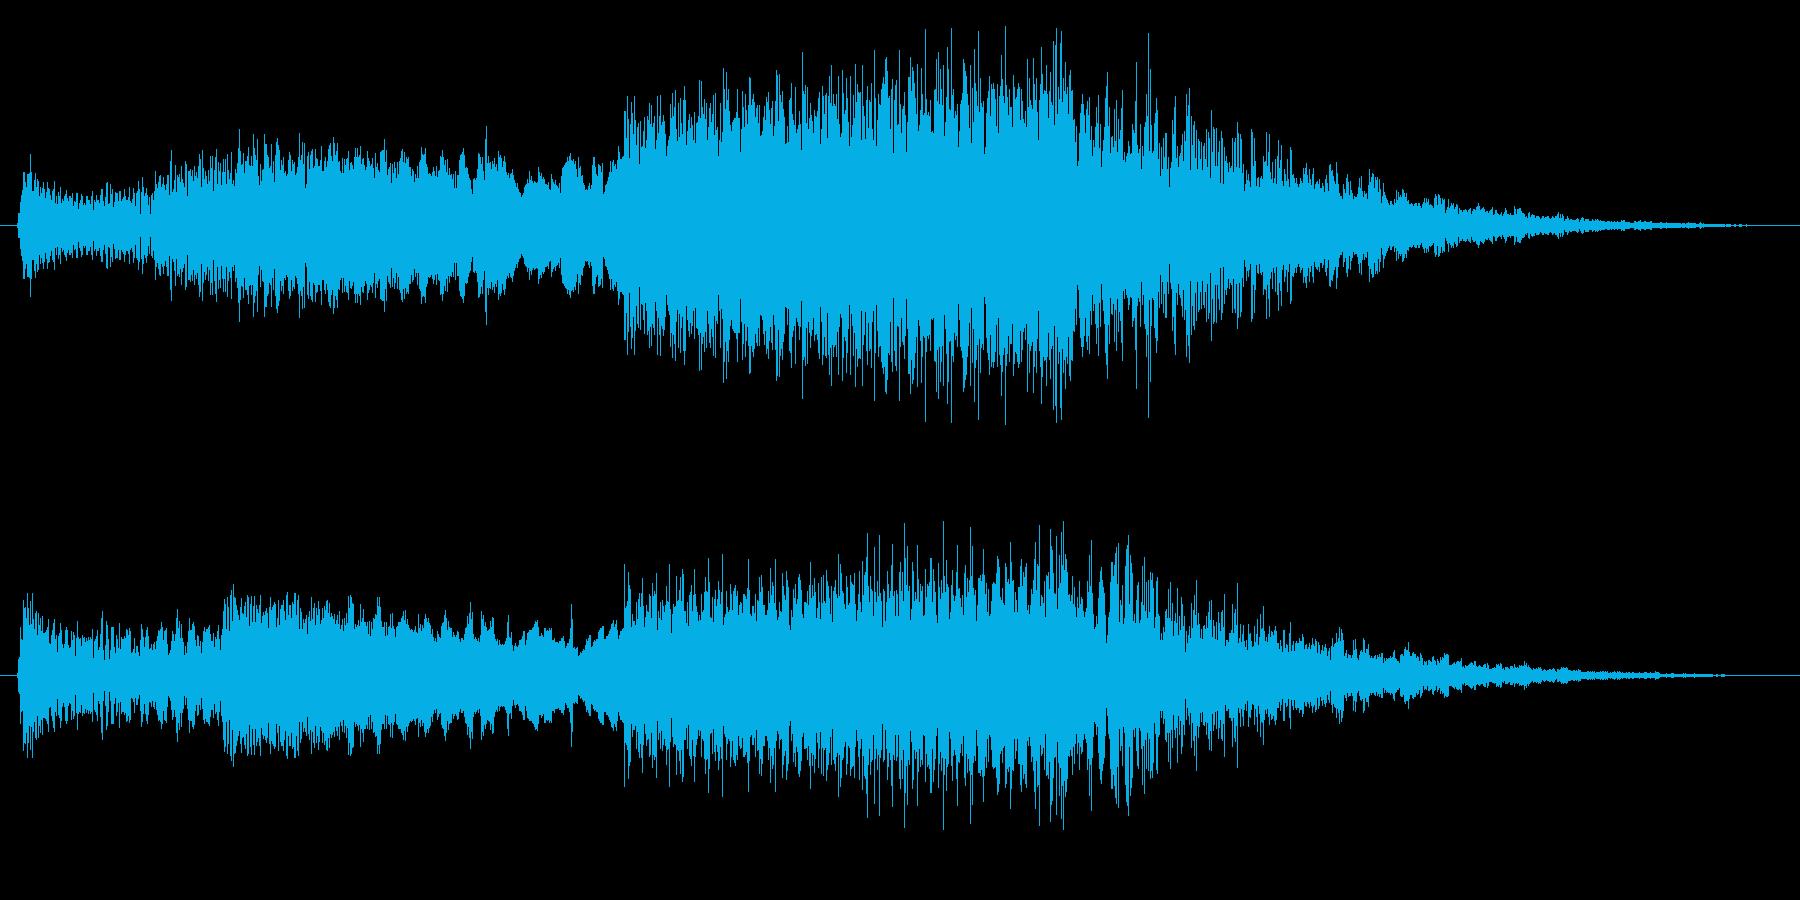 FI デバイス ライズフォール01の再生済みの波形